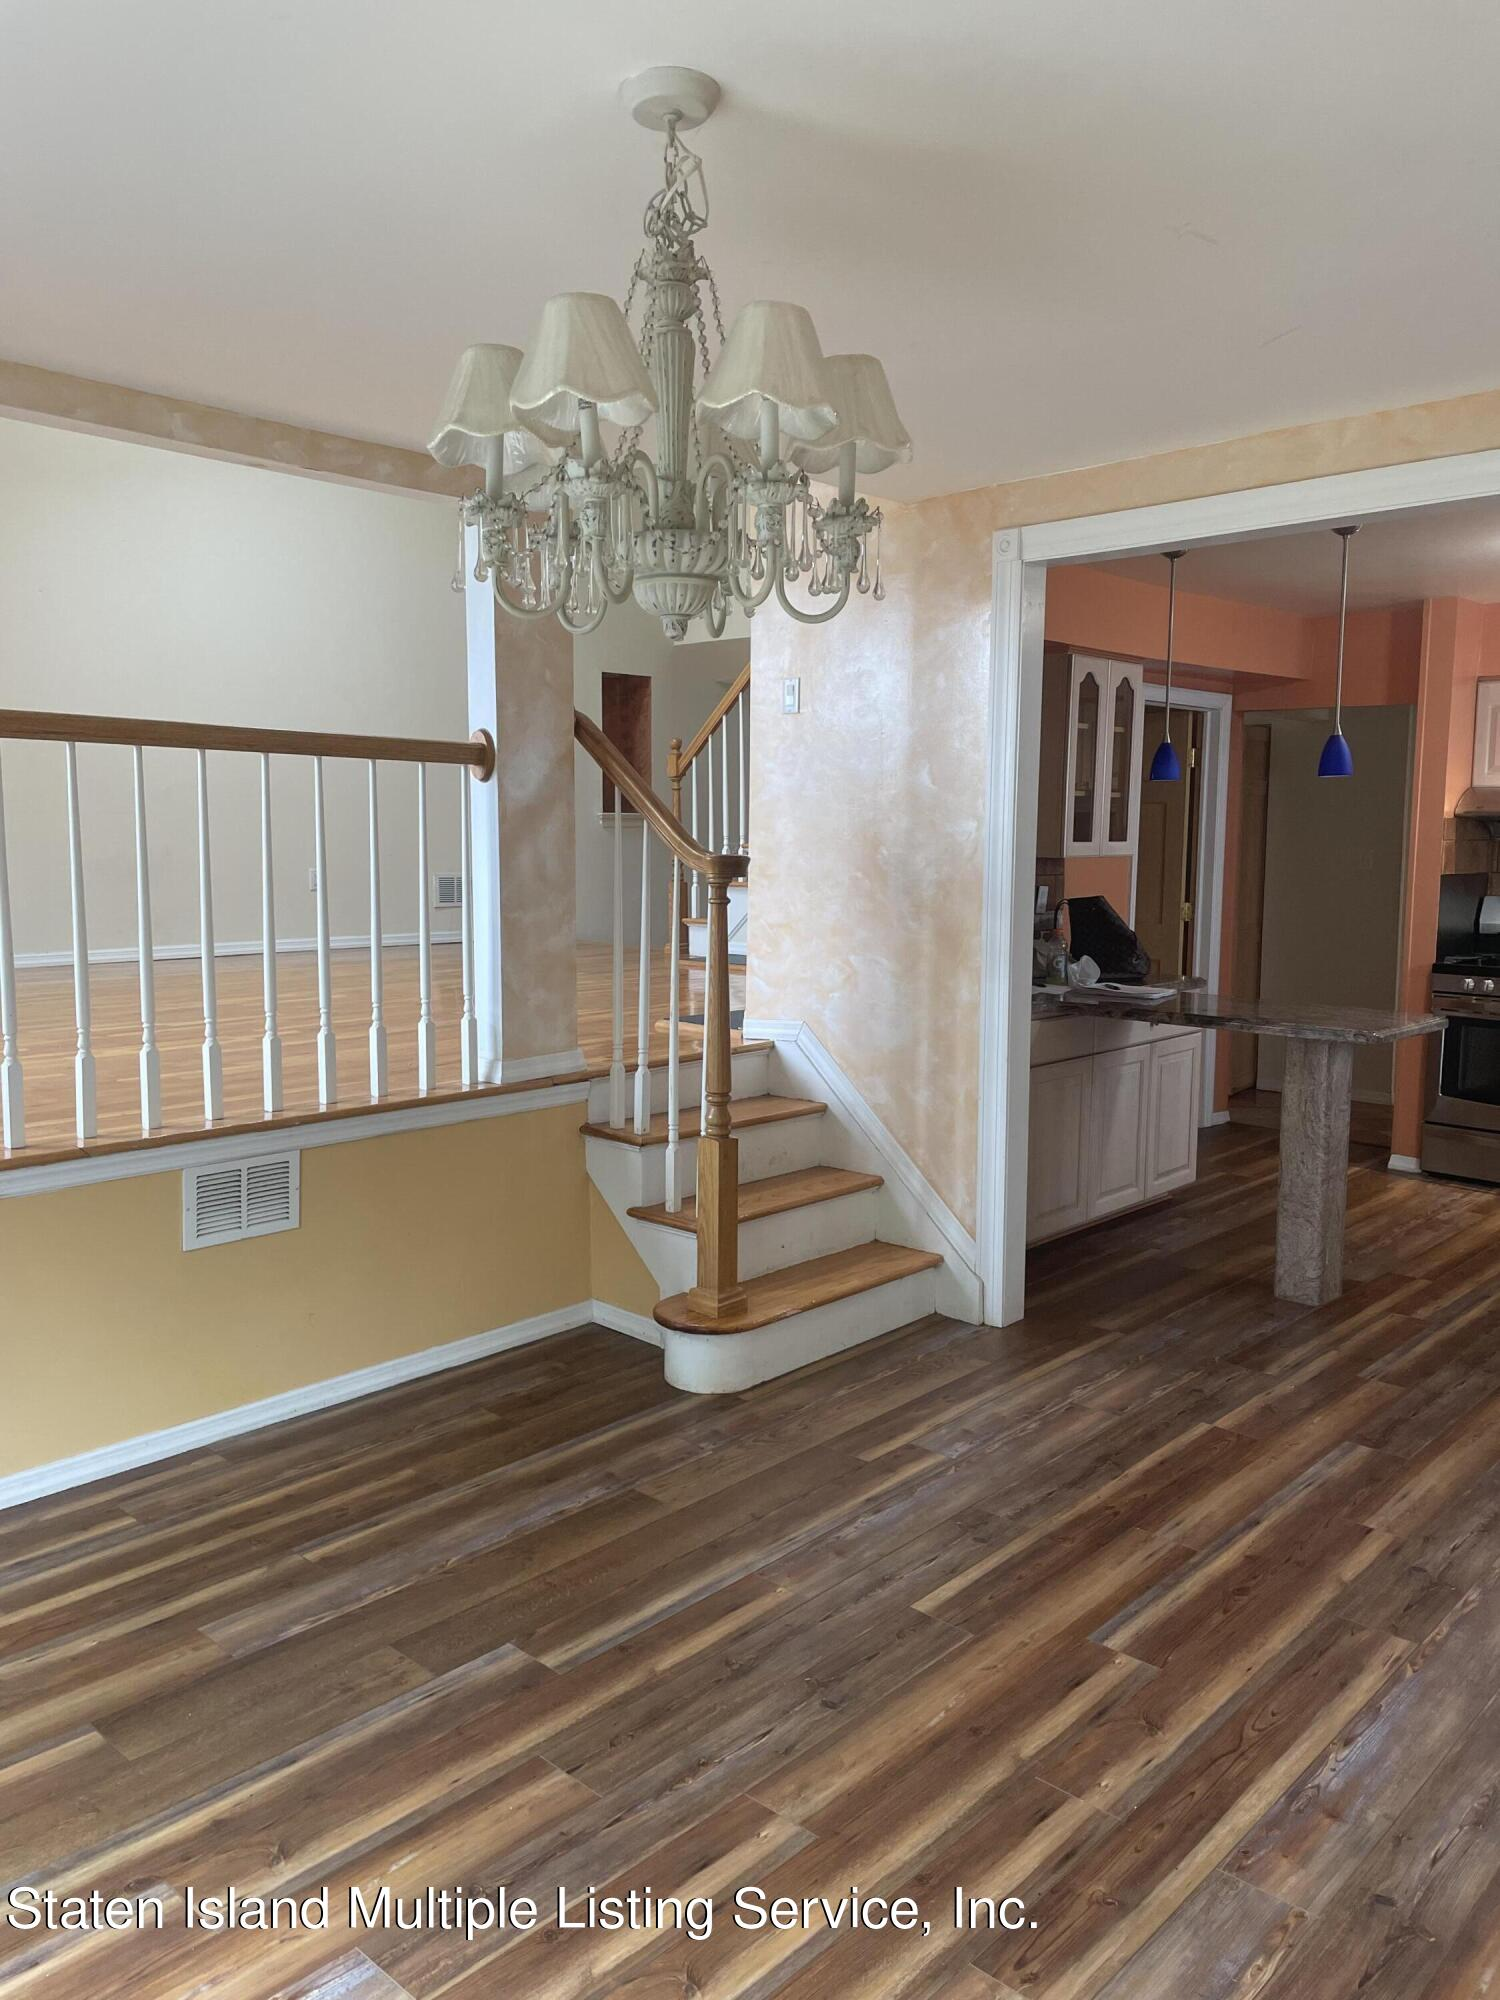 Single Family - Detached 484 Mountainview Avenue  Staten Island, NY 10314, MLS-1147175-7